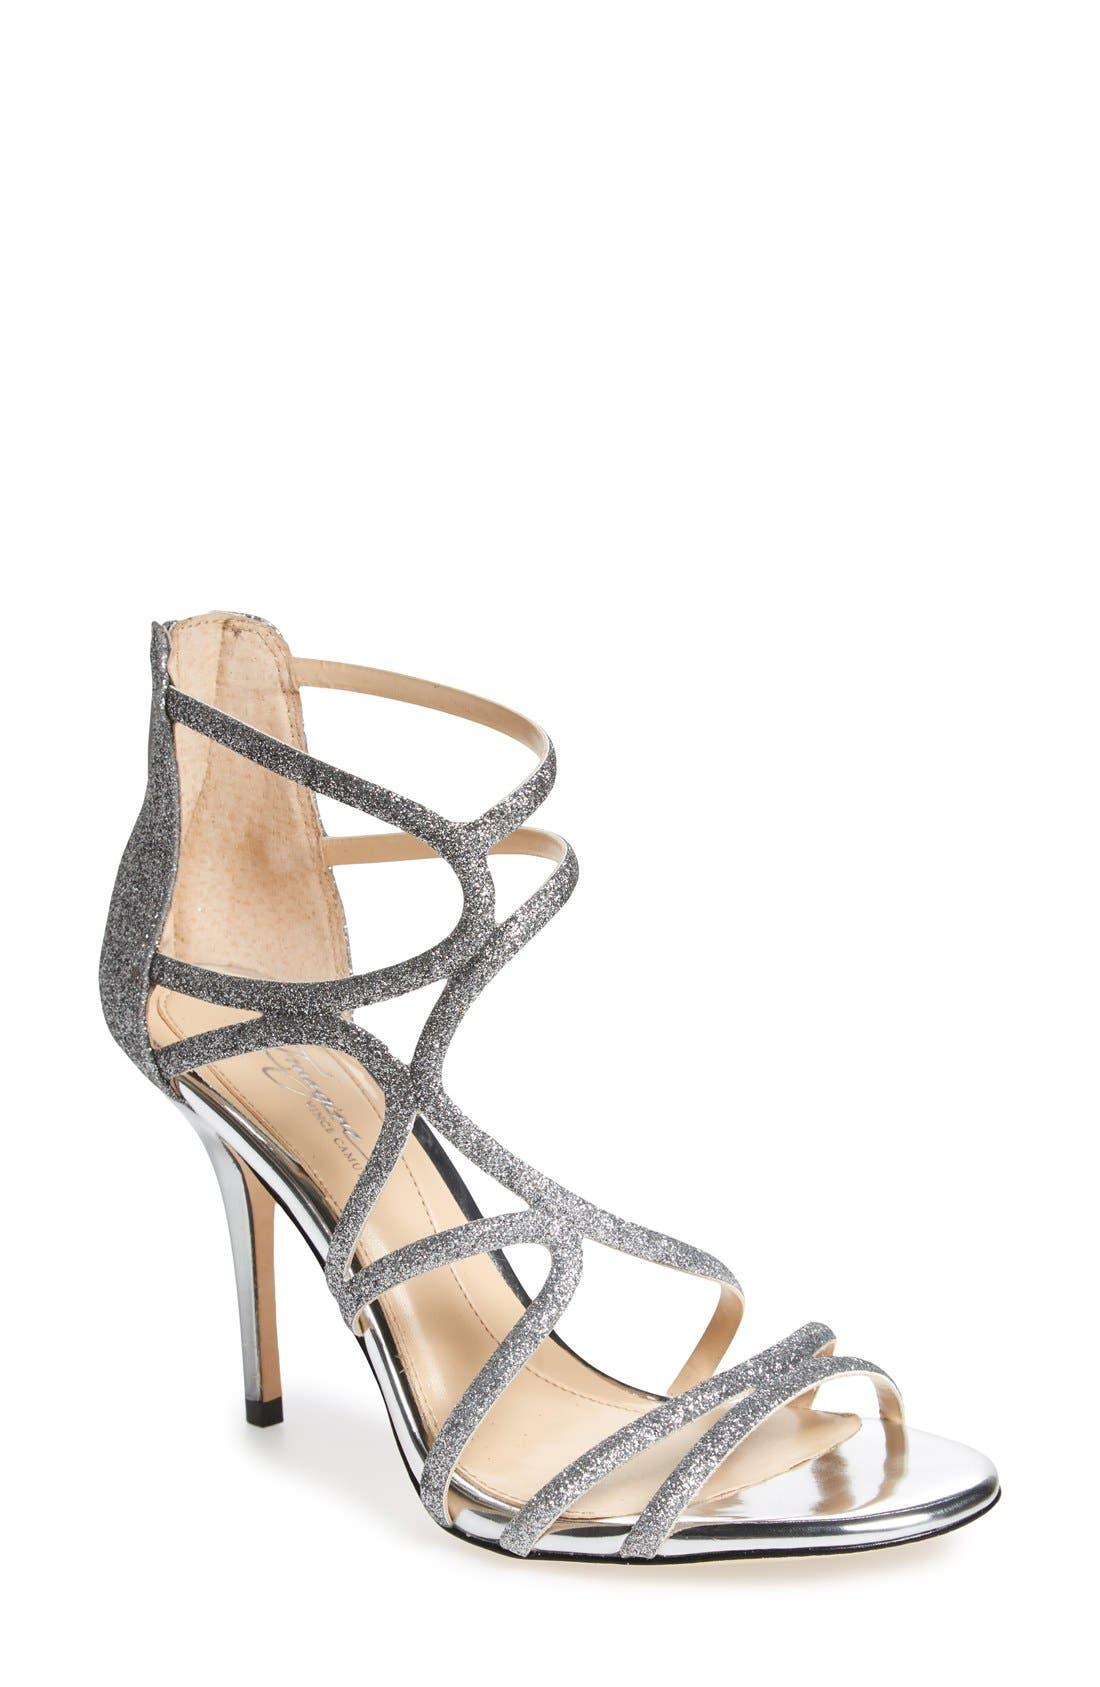 'Ranee' Dress Sandal,                             Main thumbnail 6, color,